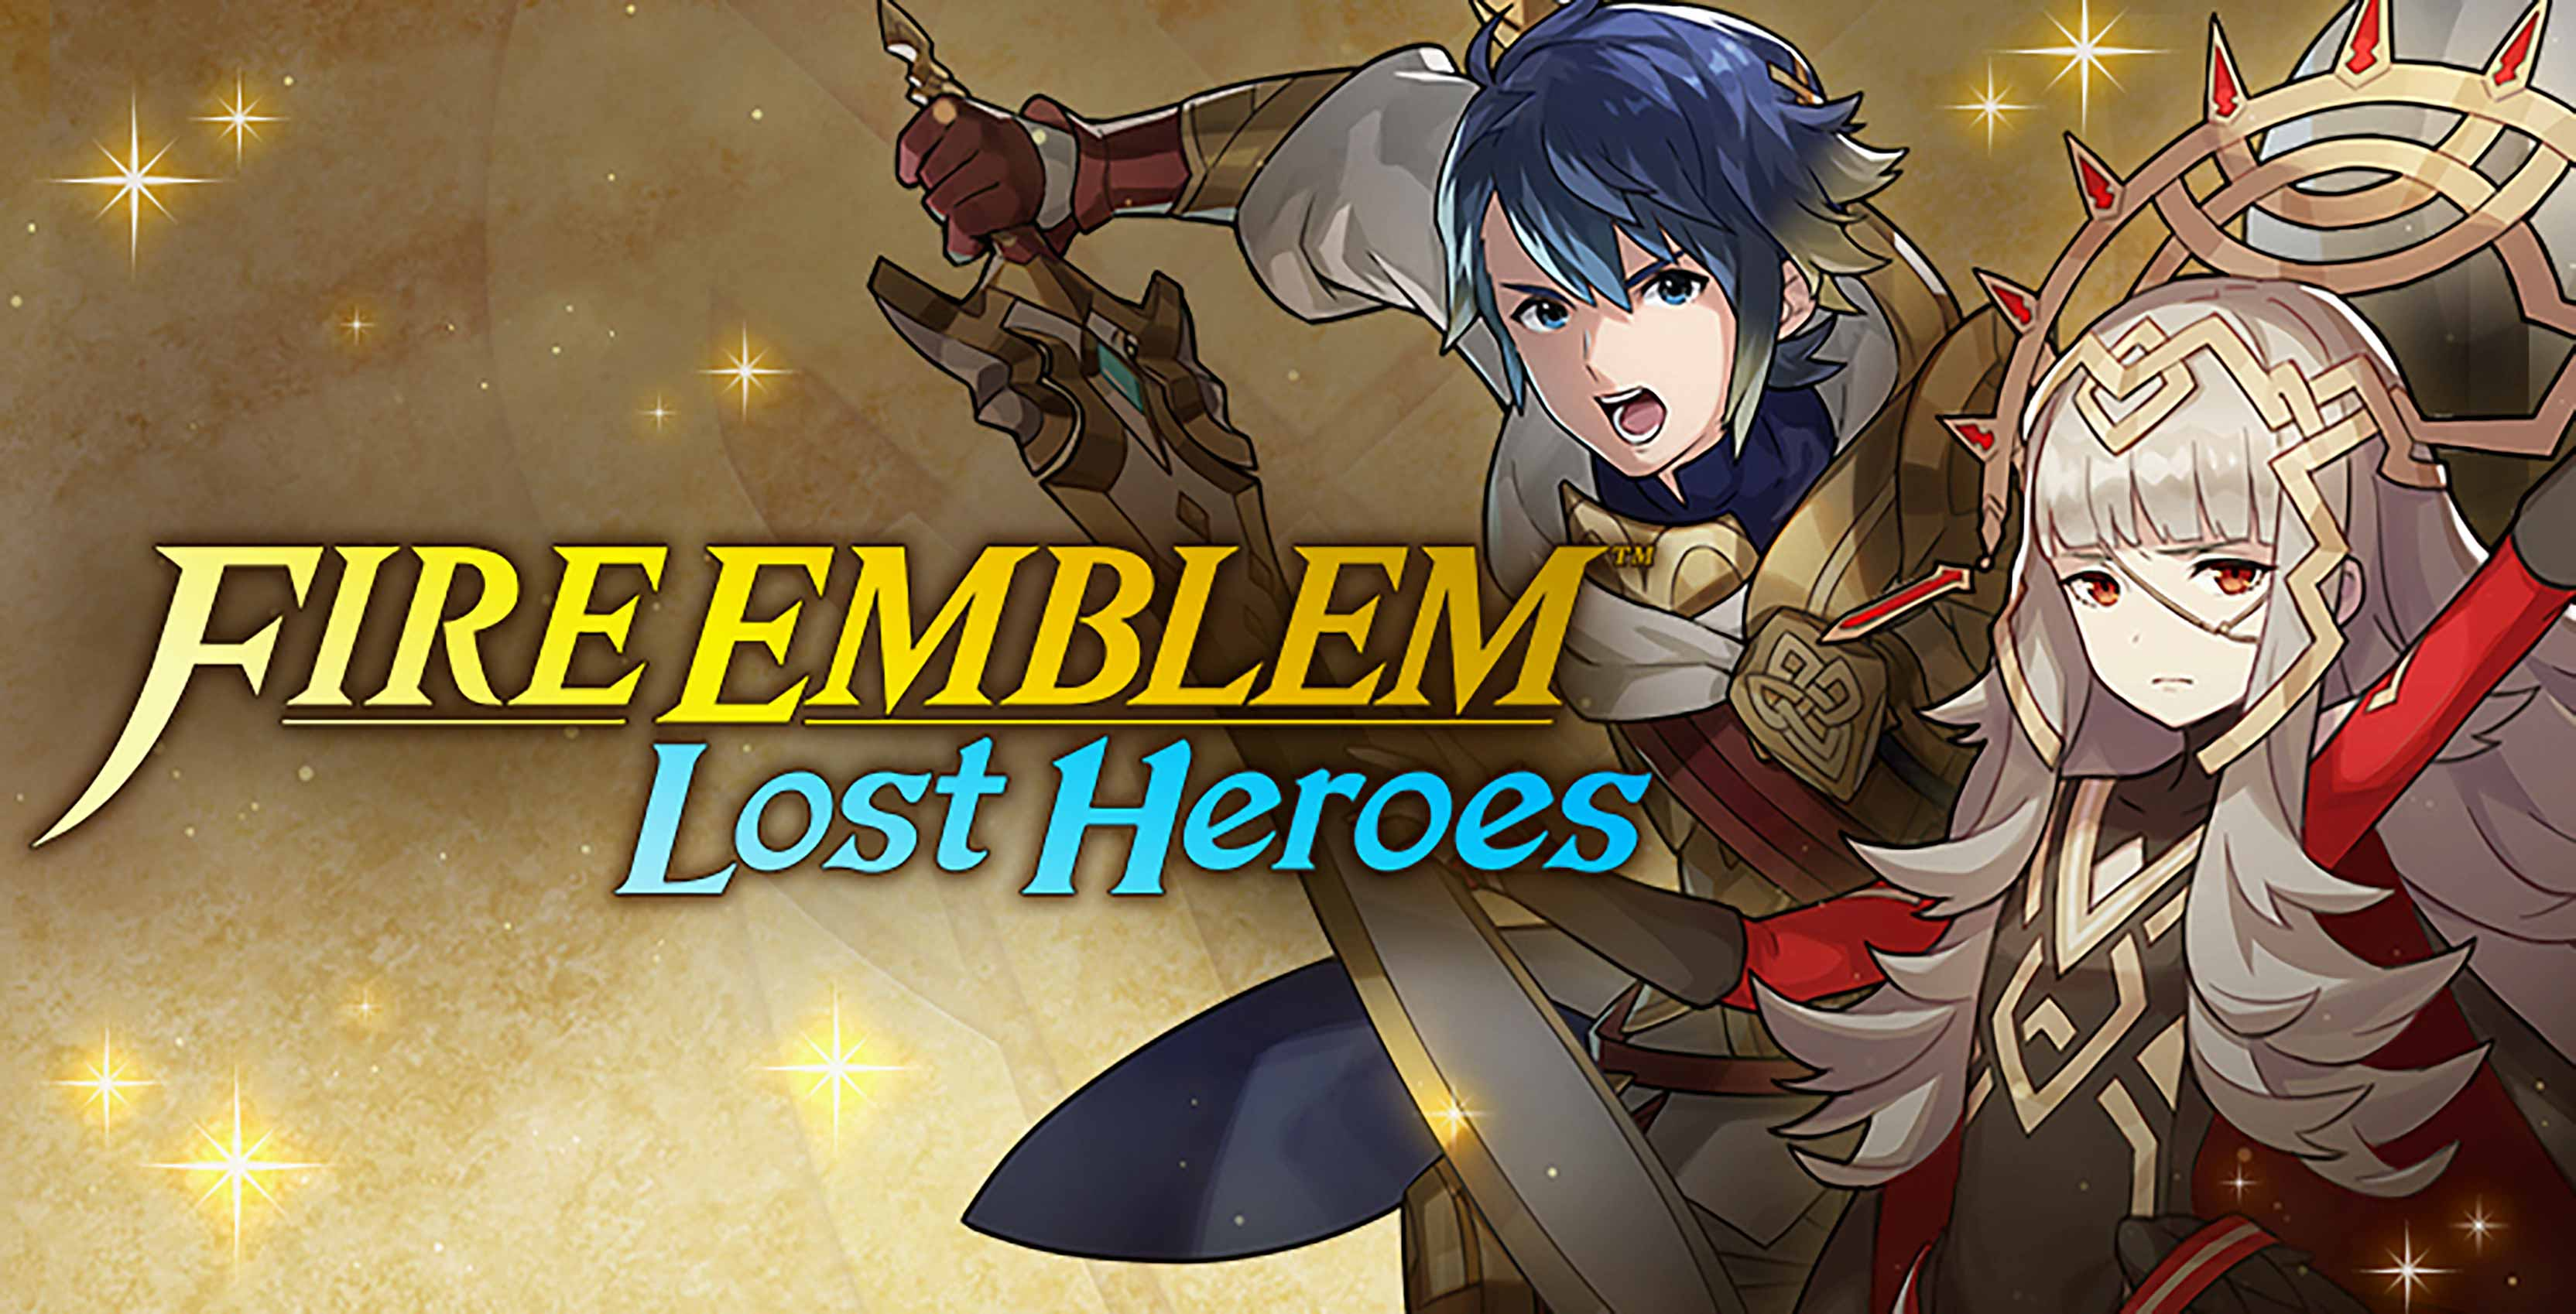 fire emblem 7 chapter 16 guide